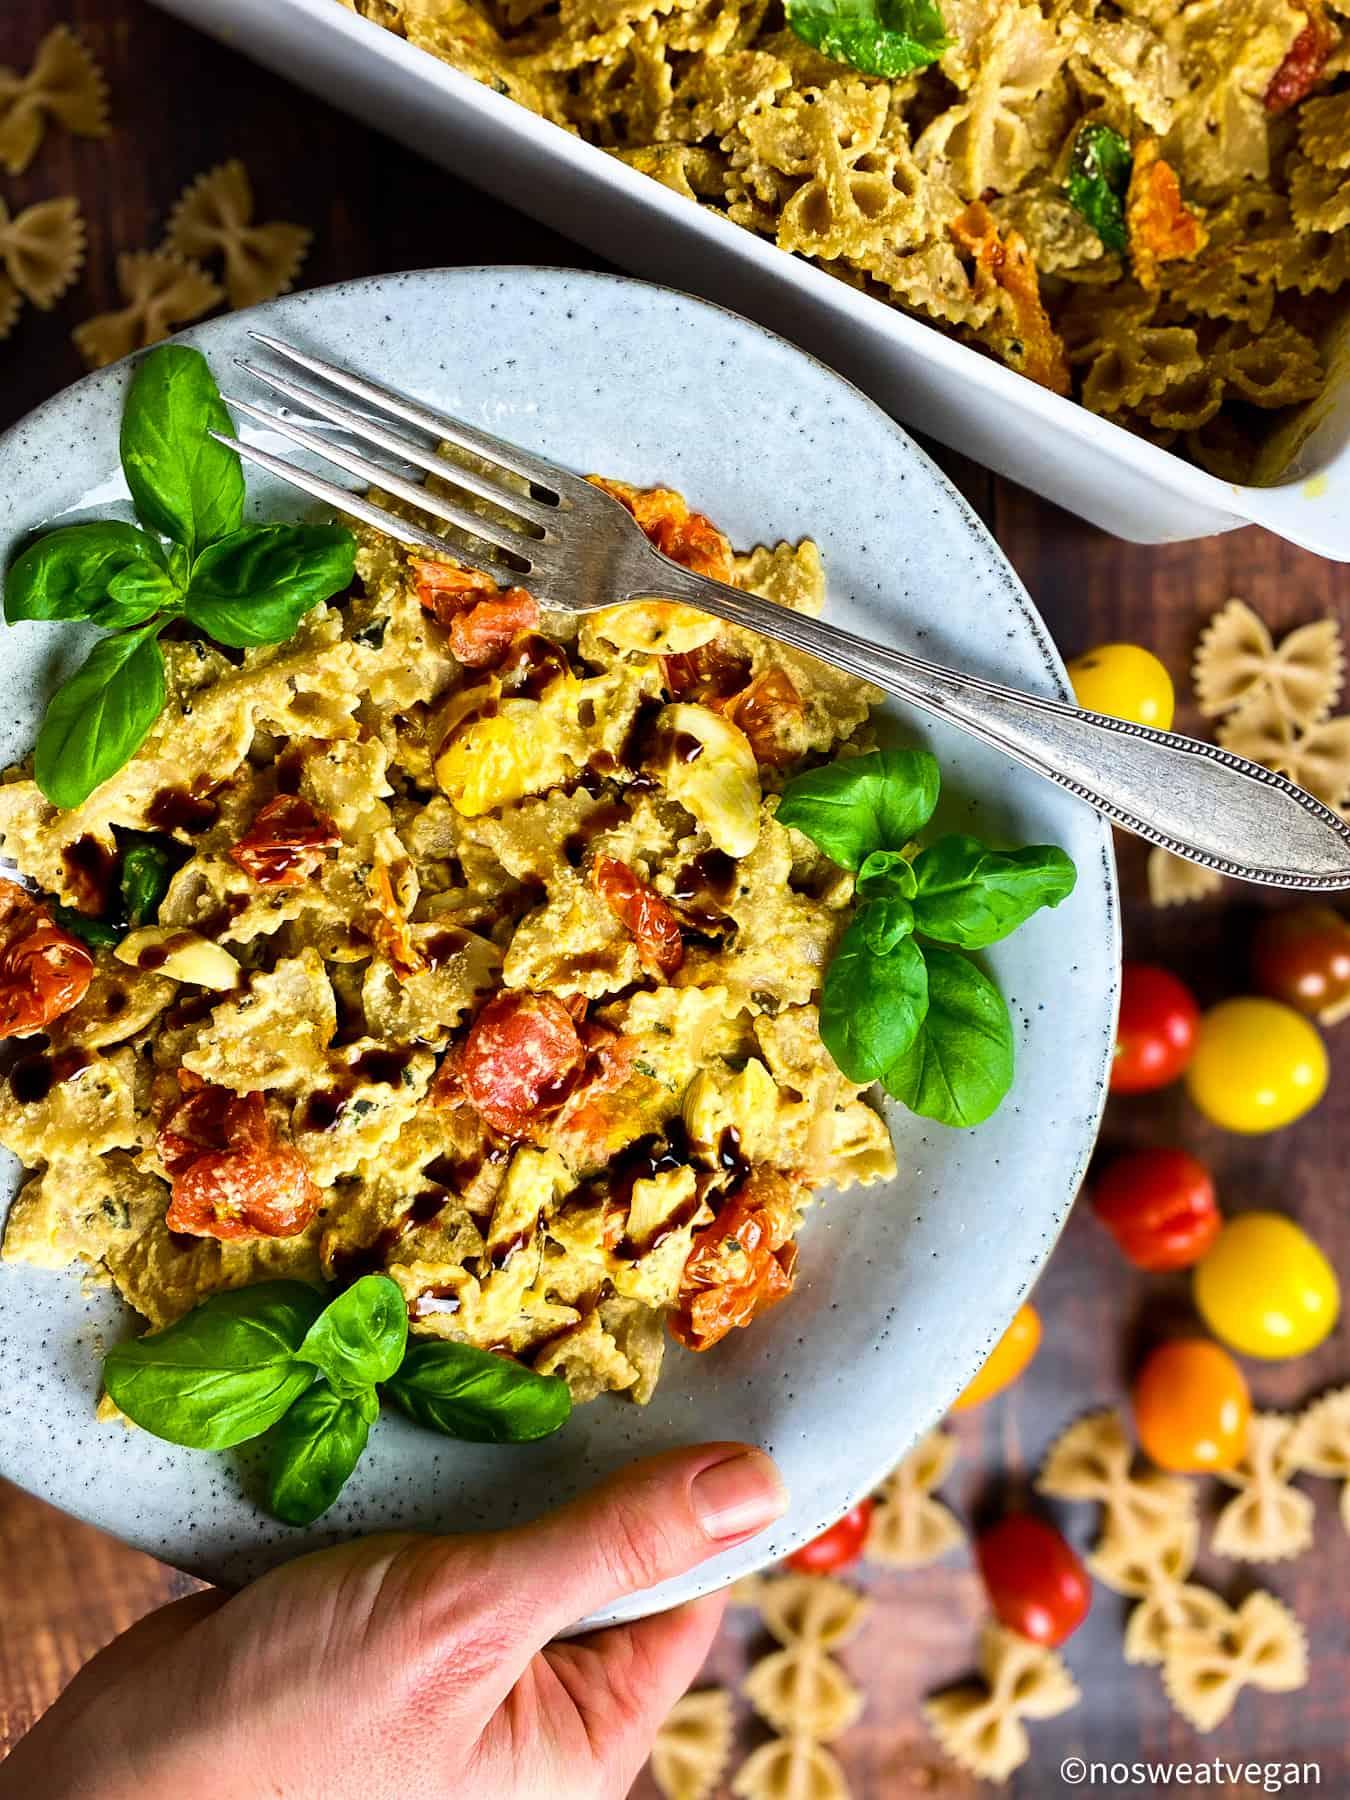 Vegan baked feta pasta in a bowl.